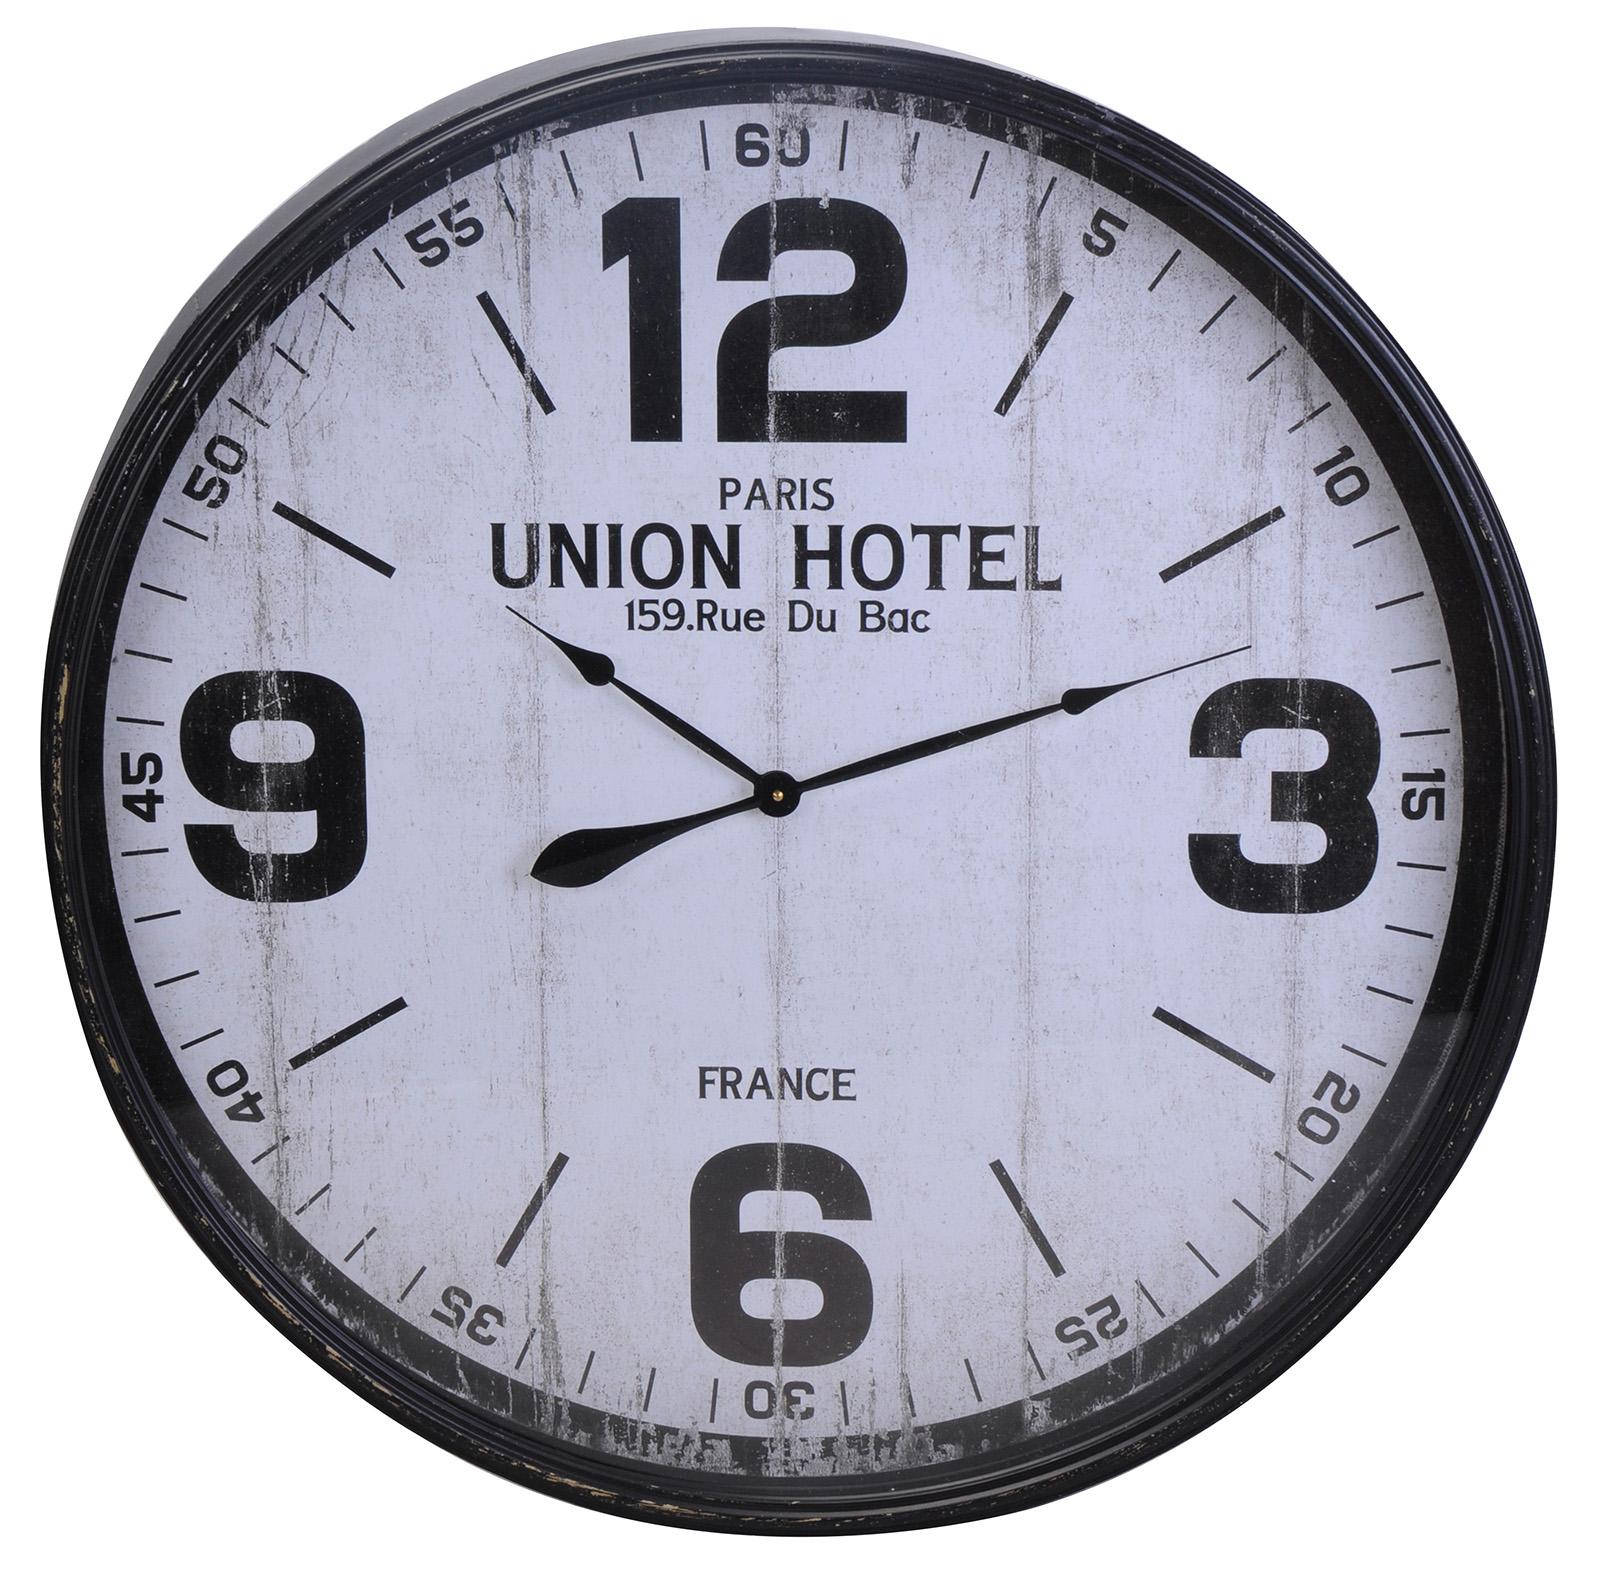 Große Wanduhr große wanduhr metall ø 90cm union hotel shabby chic wand uhr